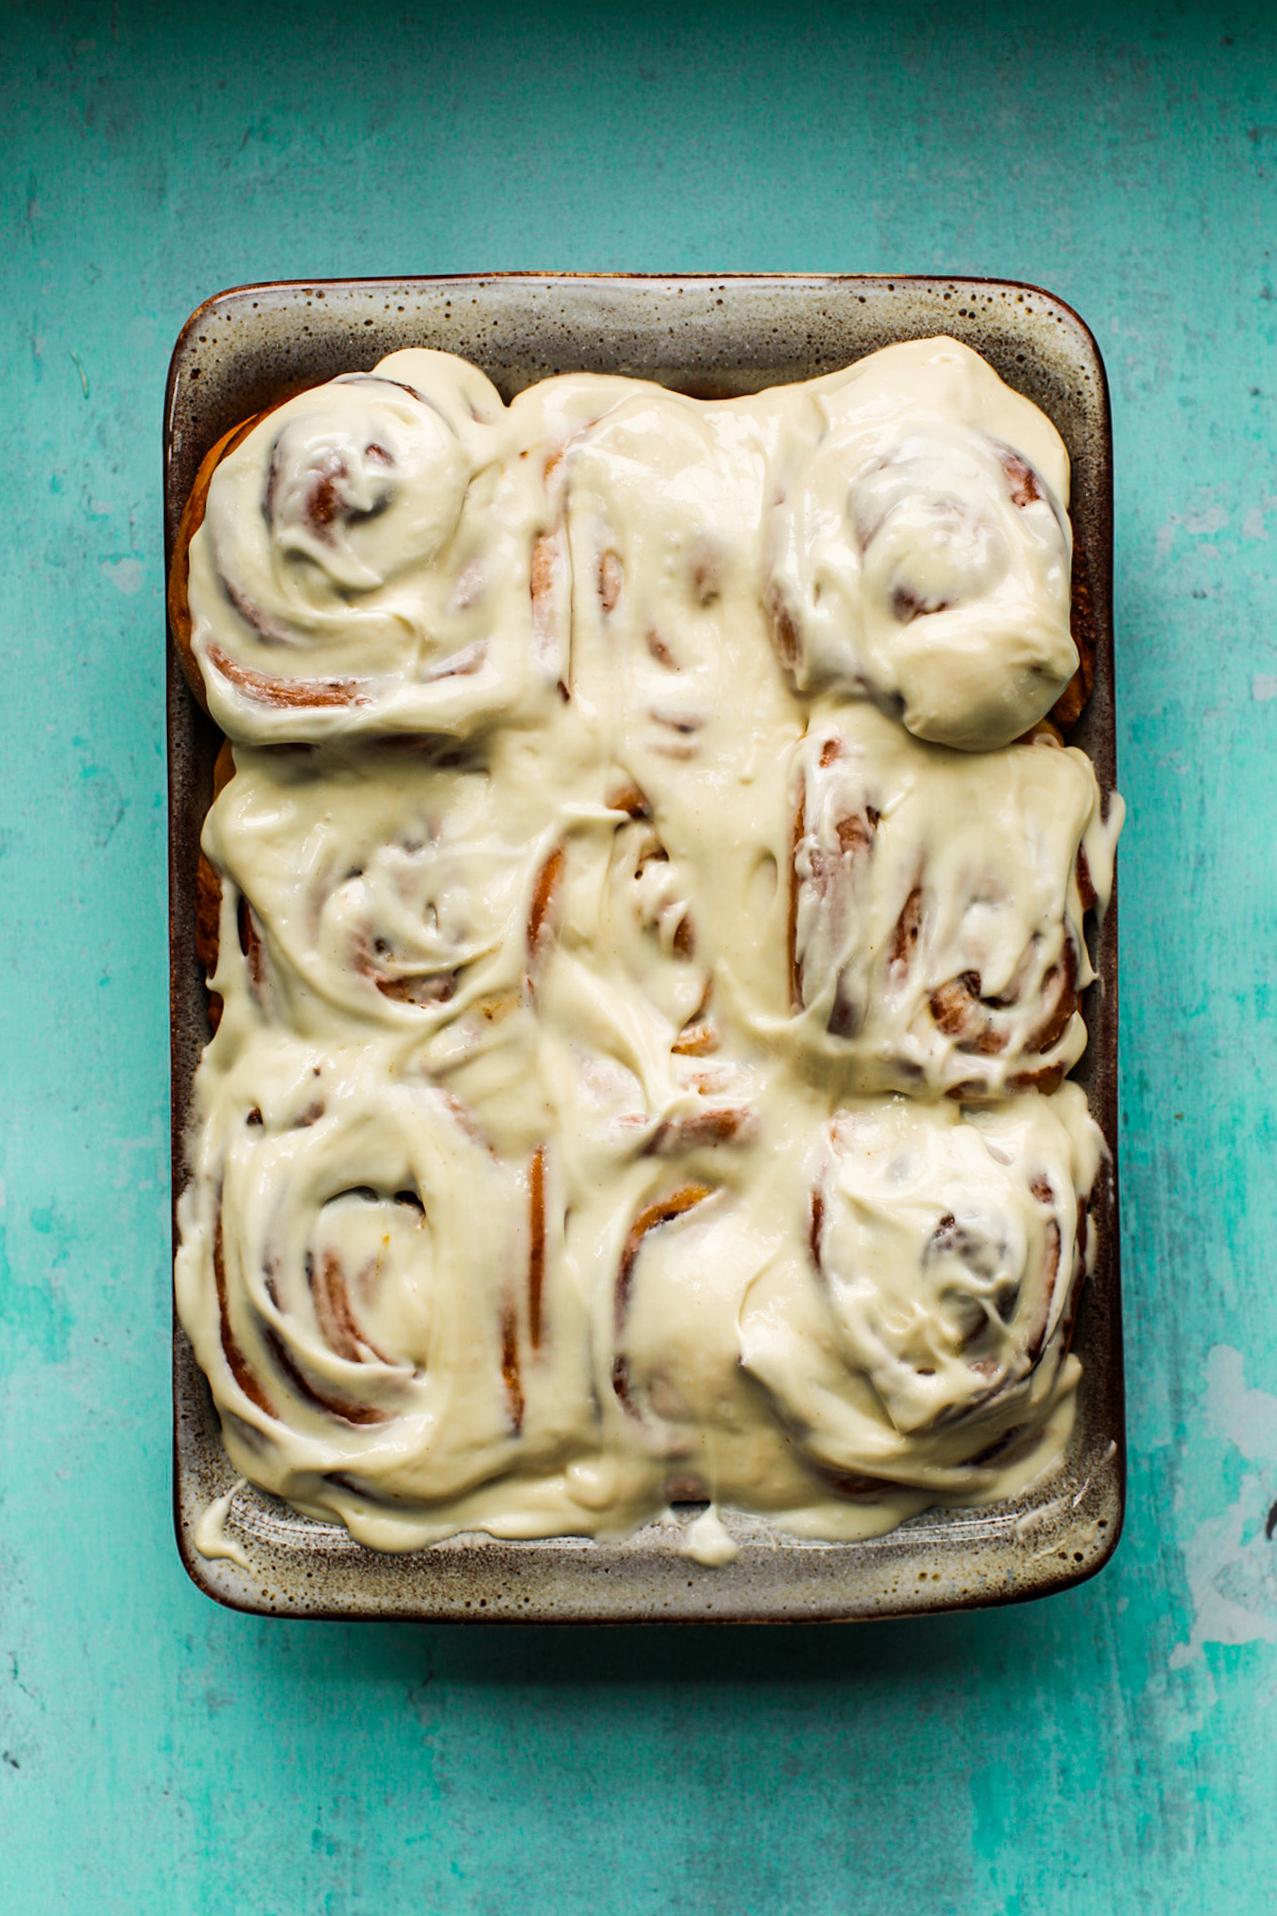 frosting on cinnamon rolls